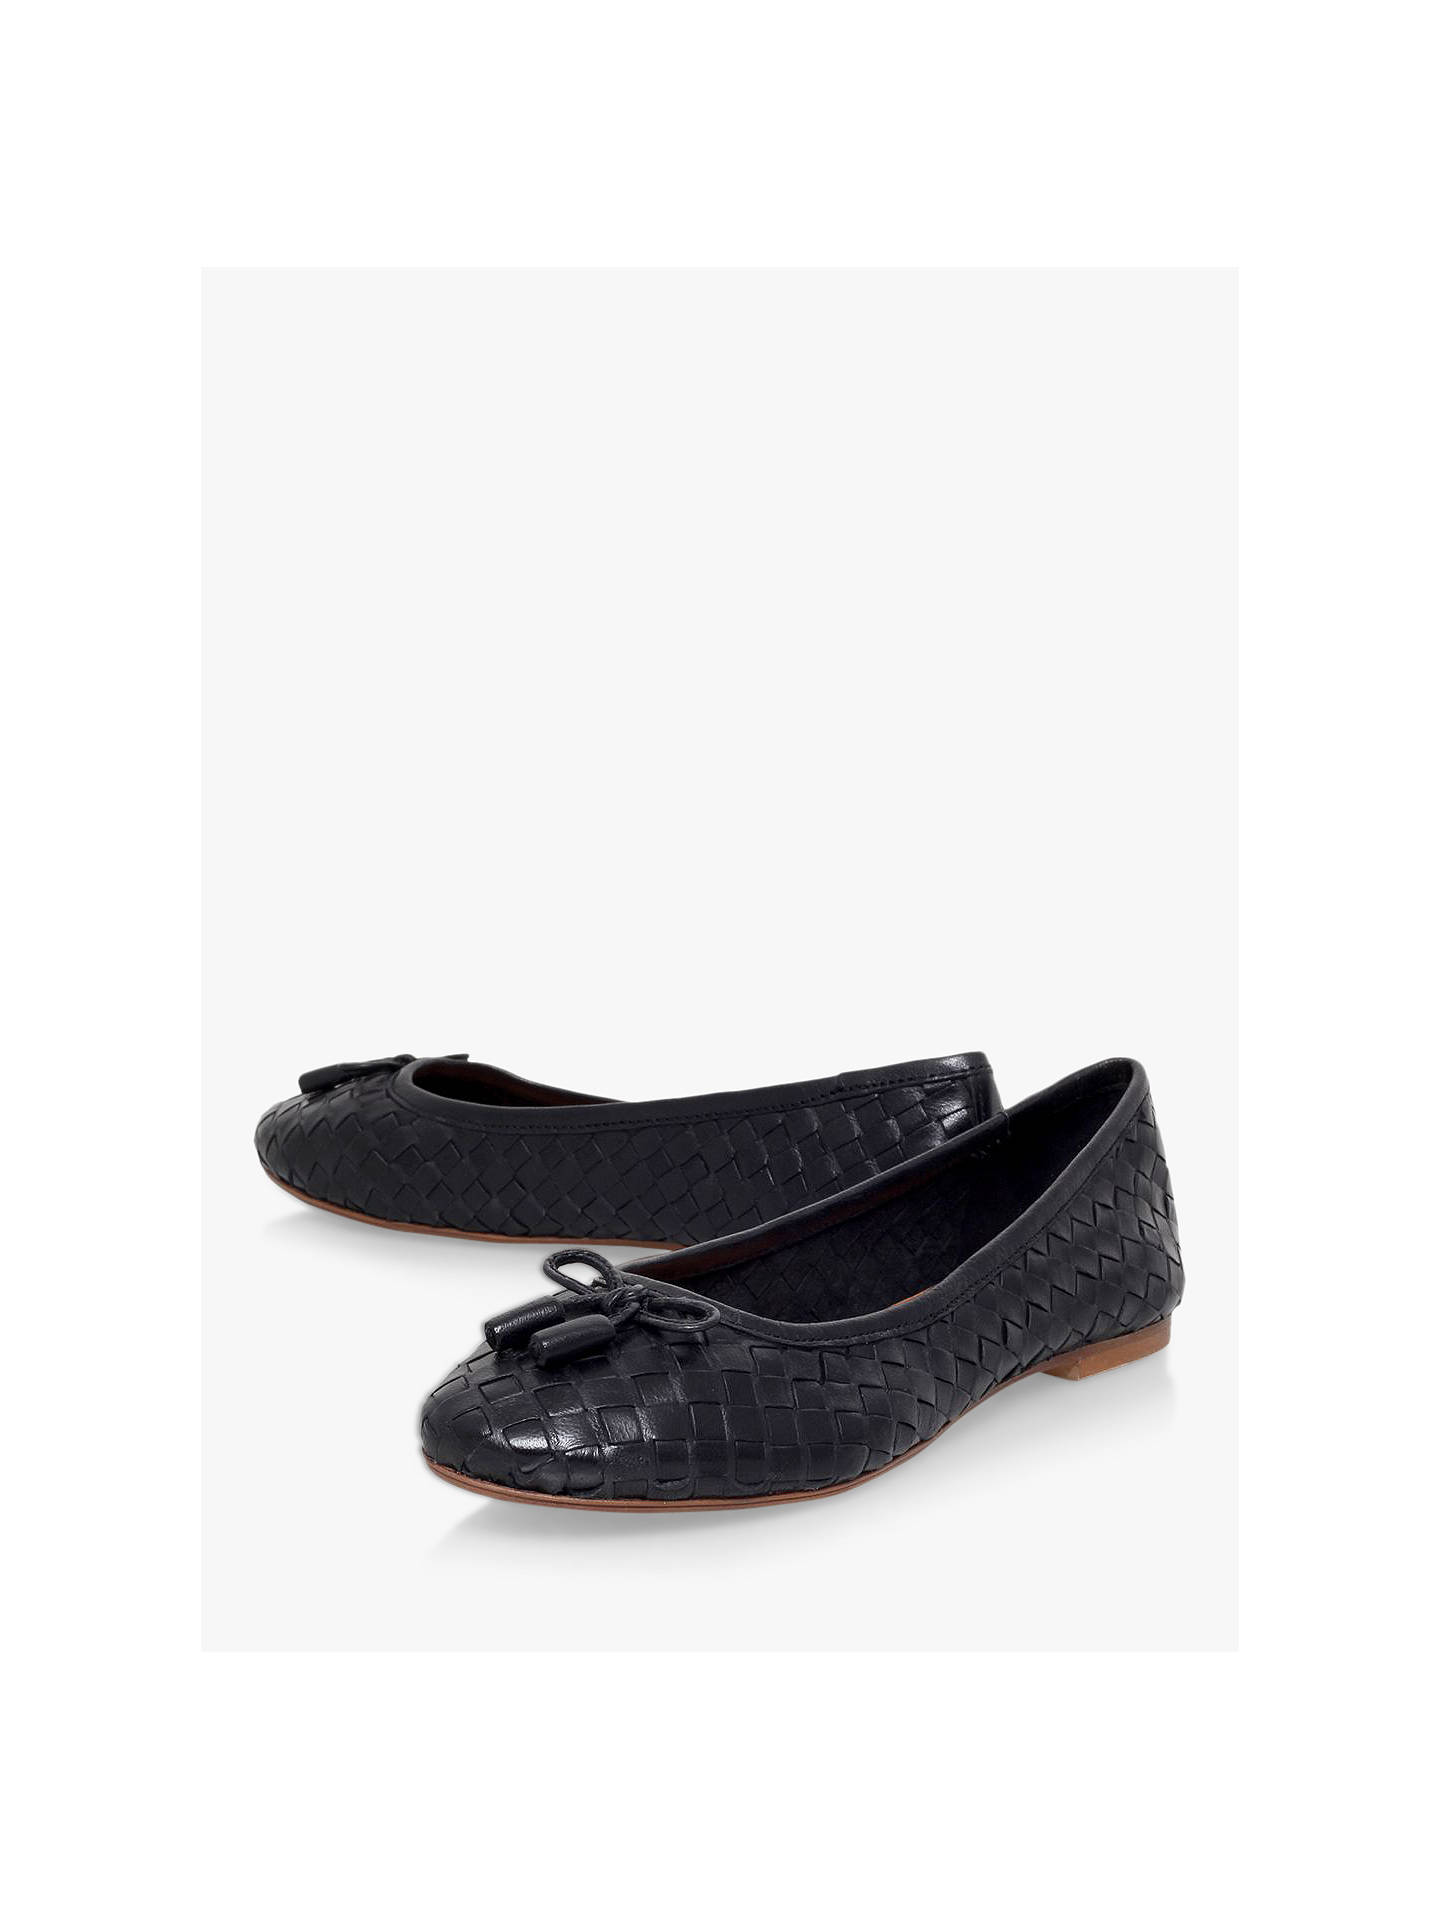 aae005f8d ... Buy Carvela Luggage Woven Ballerina Pumps, Black Leather, 3 Online at  johnlewis.com ...